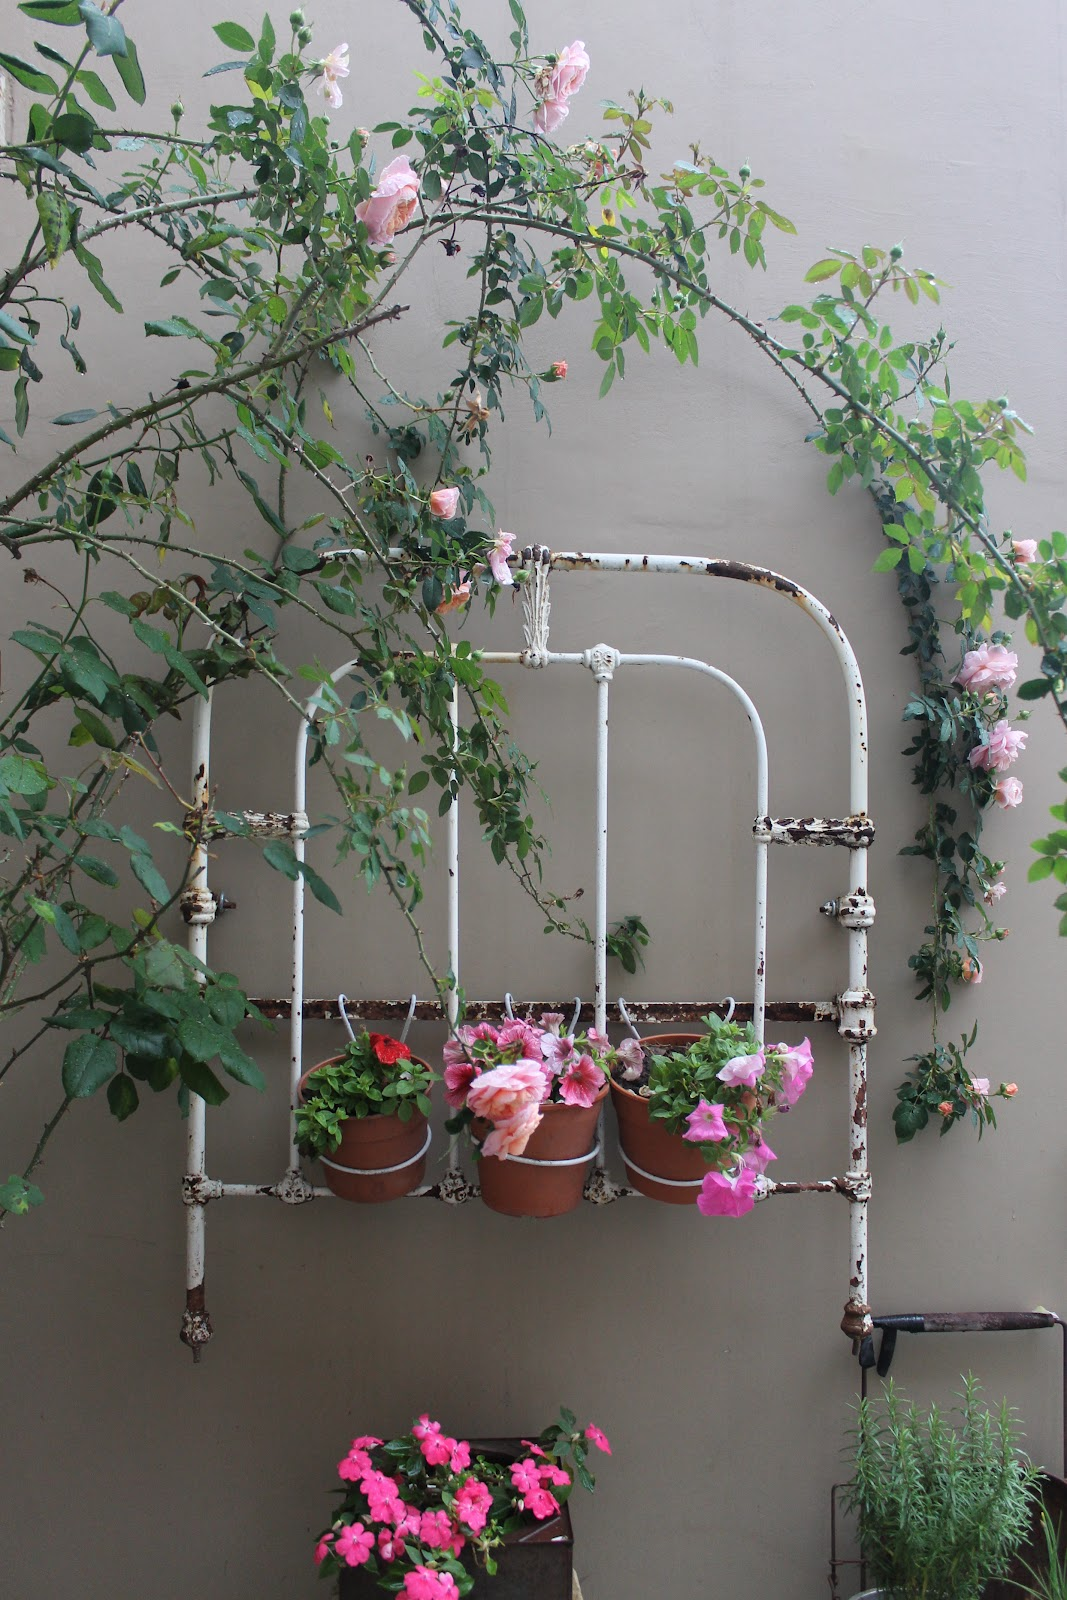 Colaboraci n programa jardineras util sima deco marce for Bases para jardineras